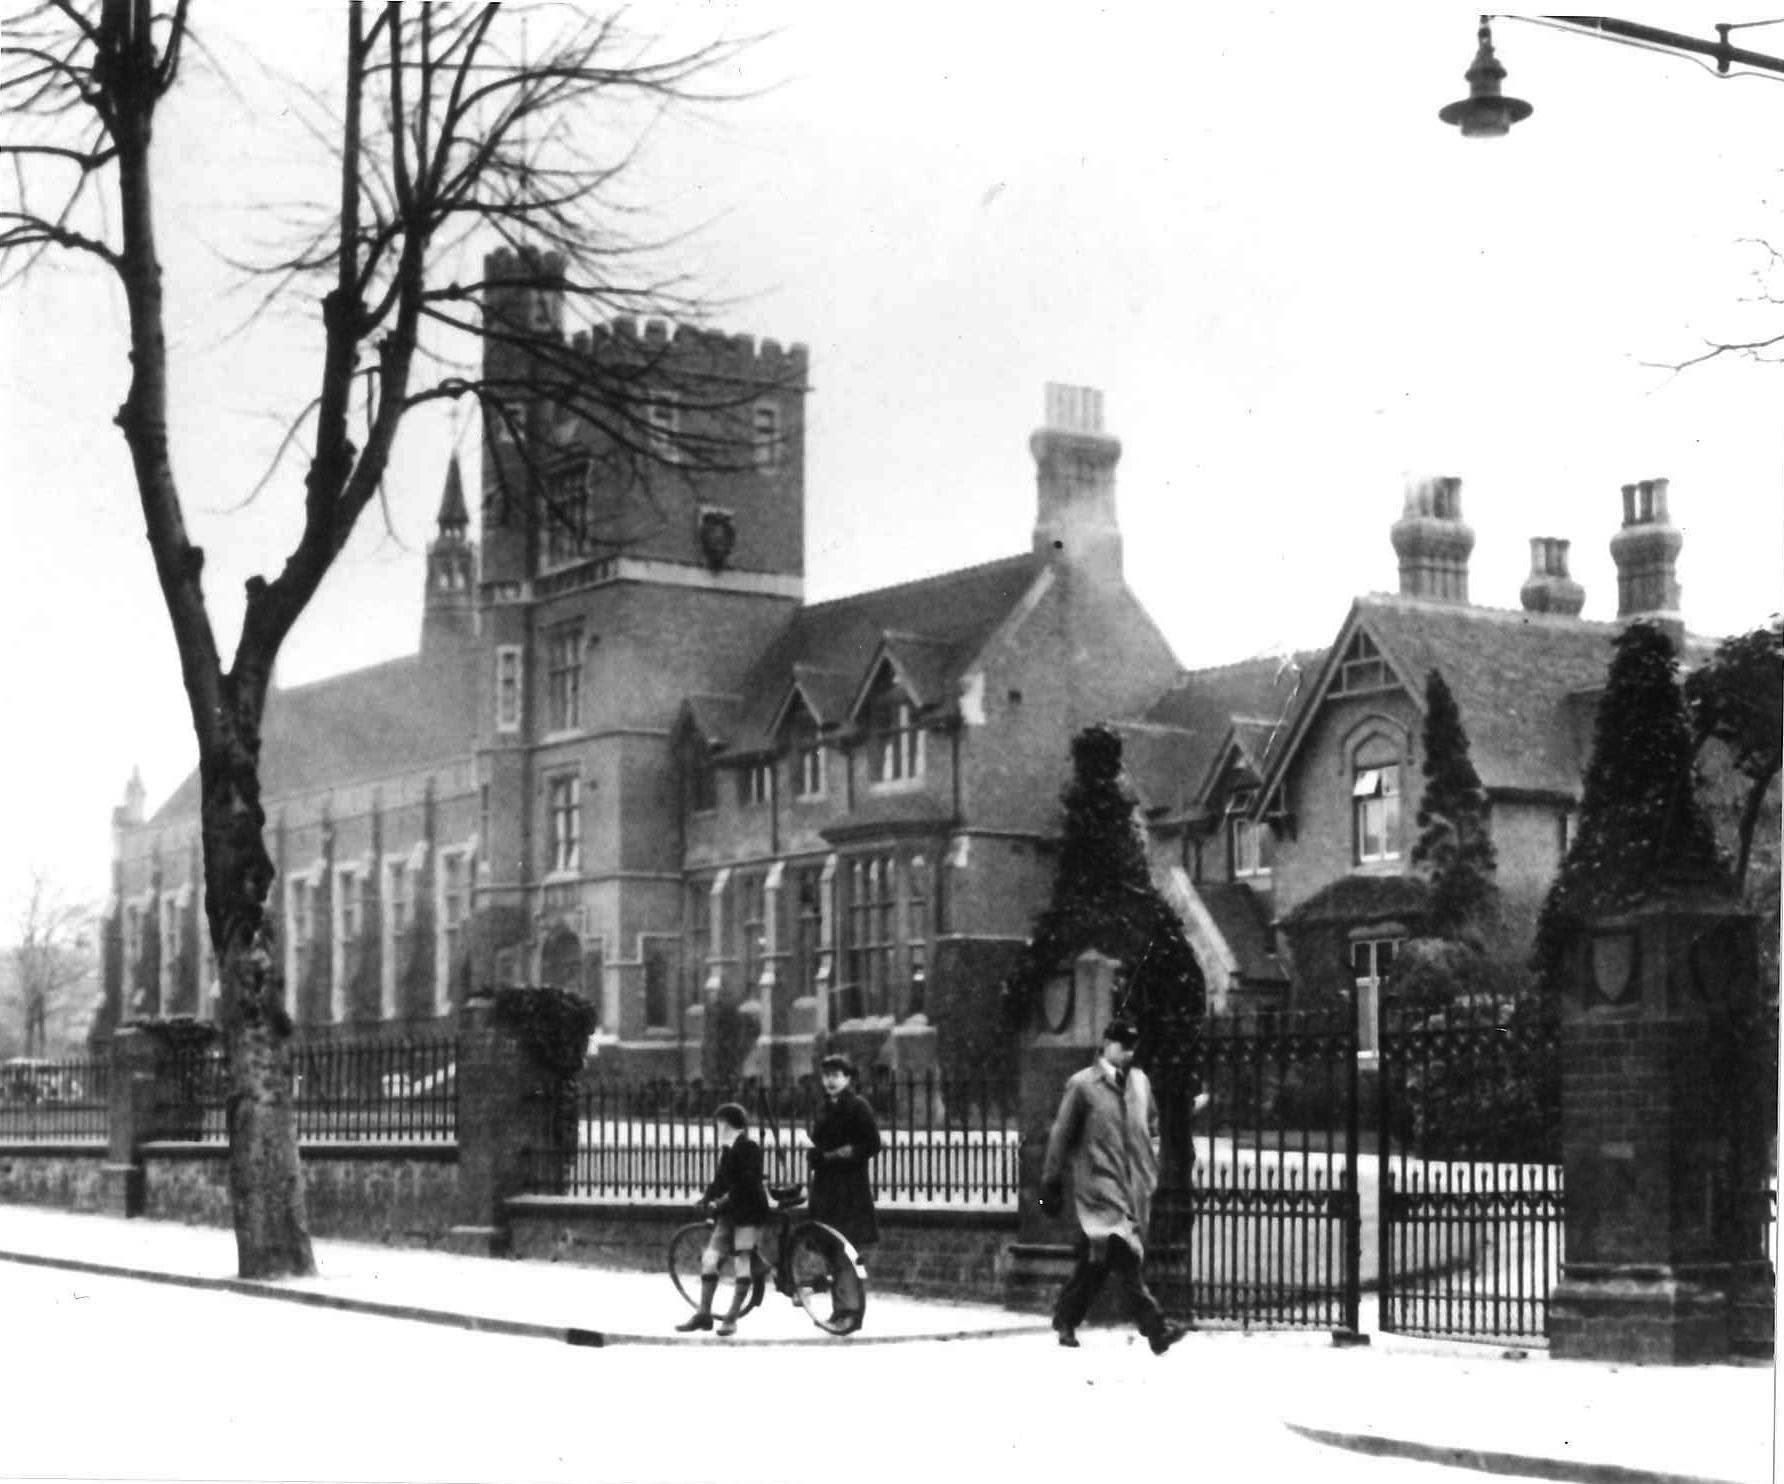 Wolverhampton Grammar School's history